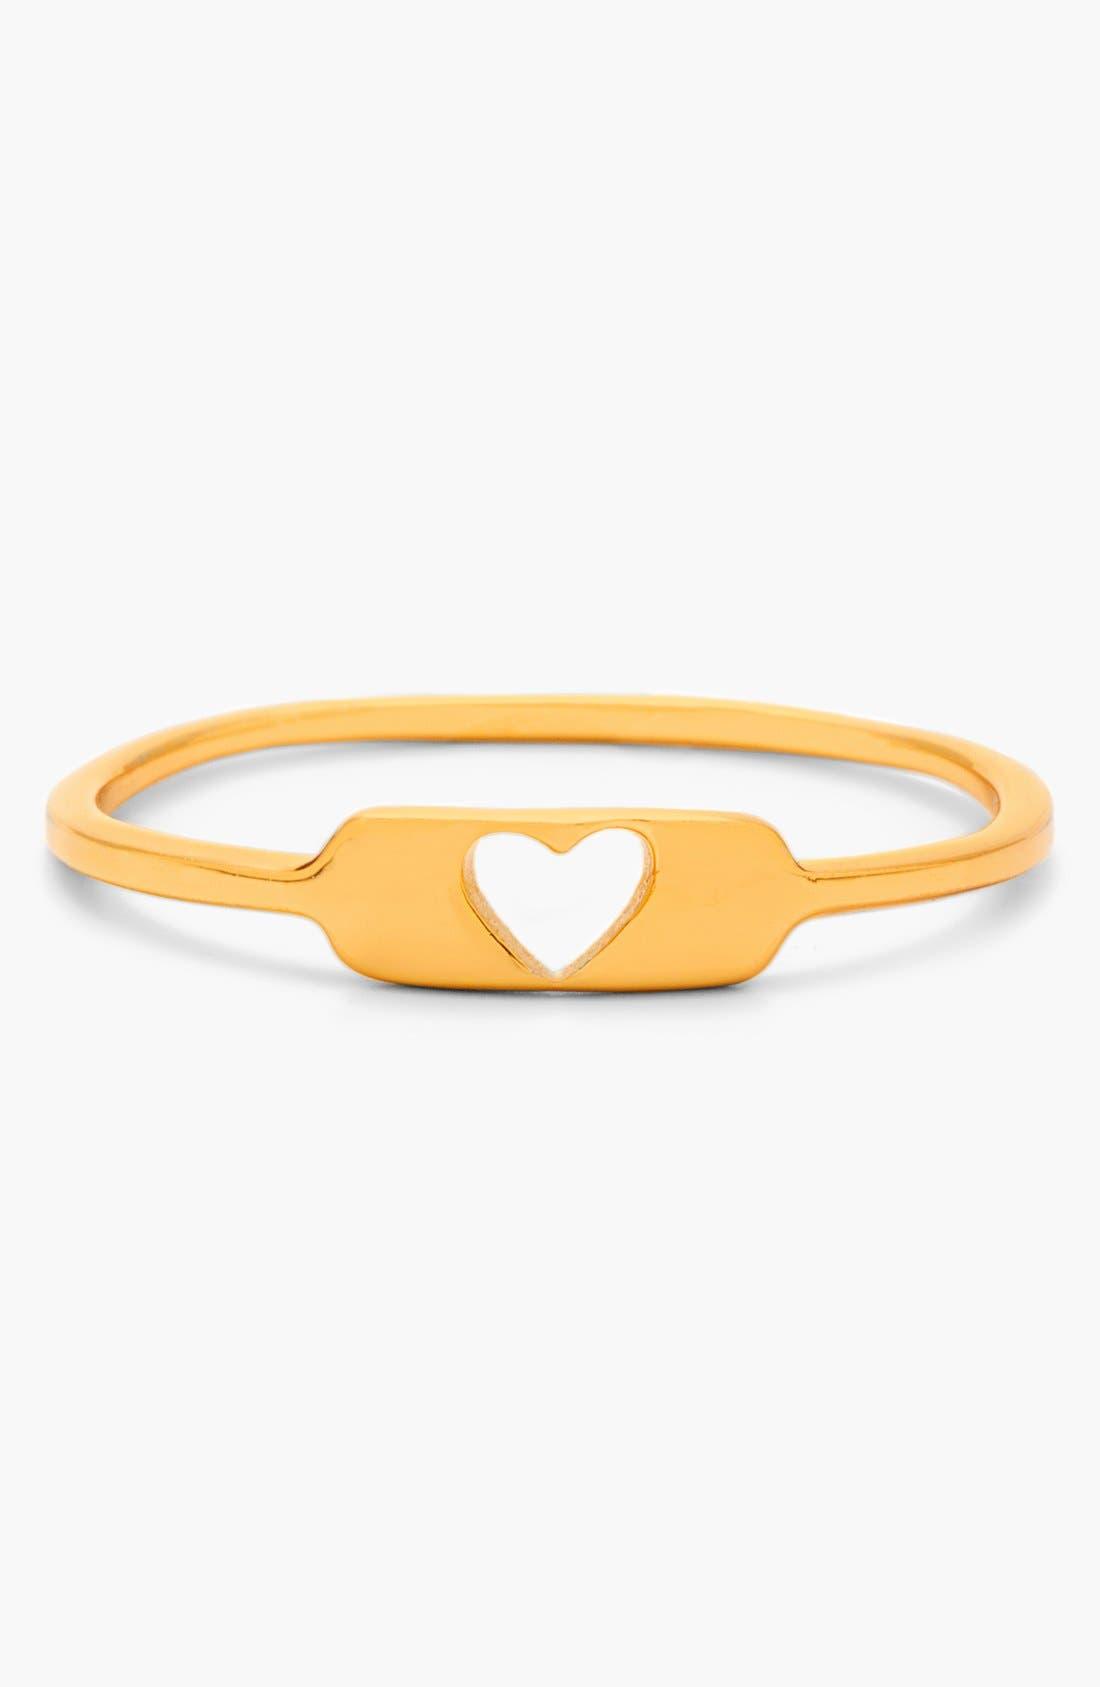 Main Image - gorjana 'Cutout Heart' Ring